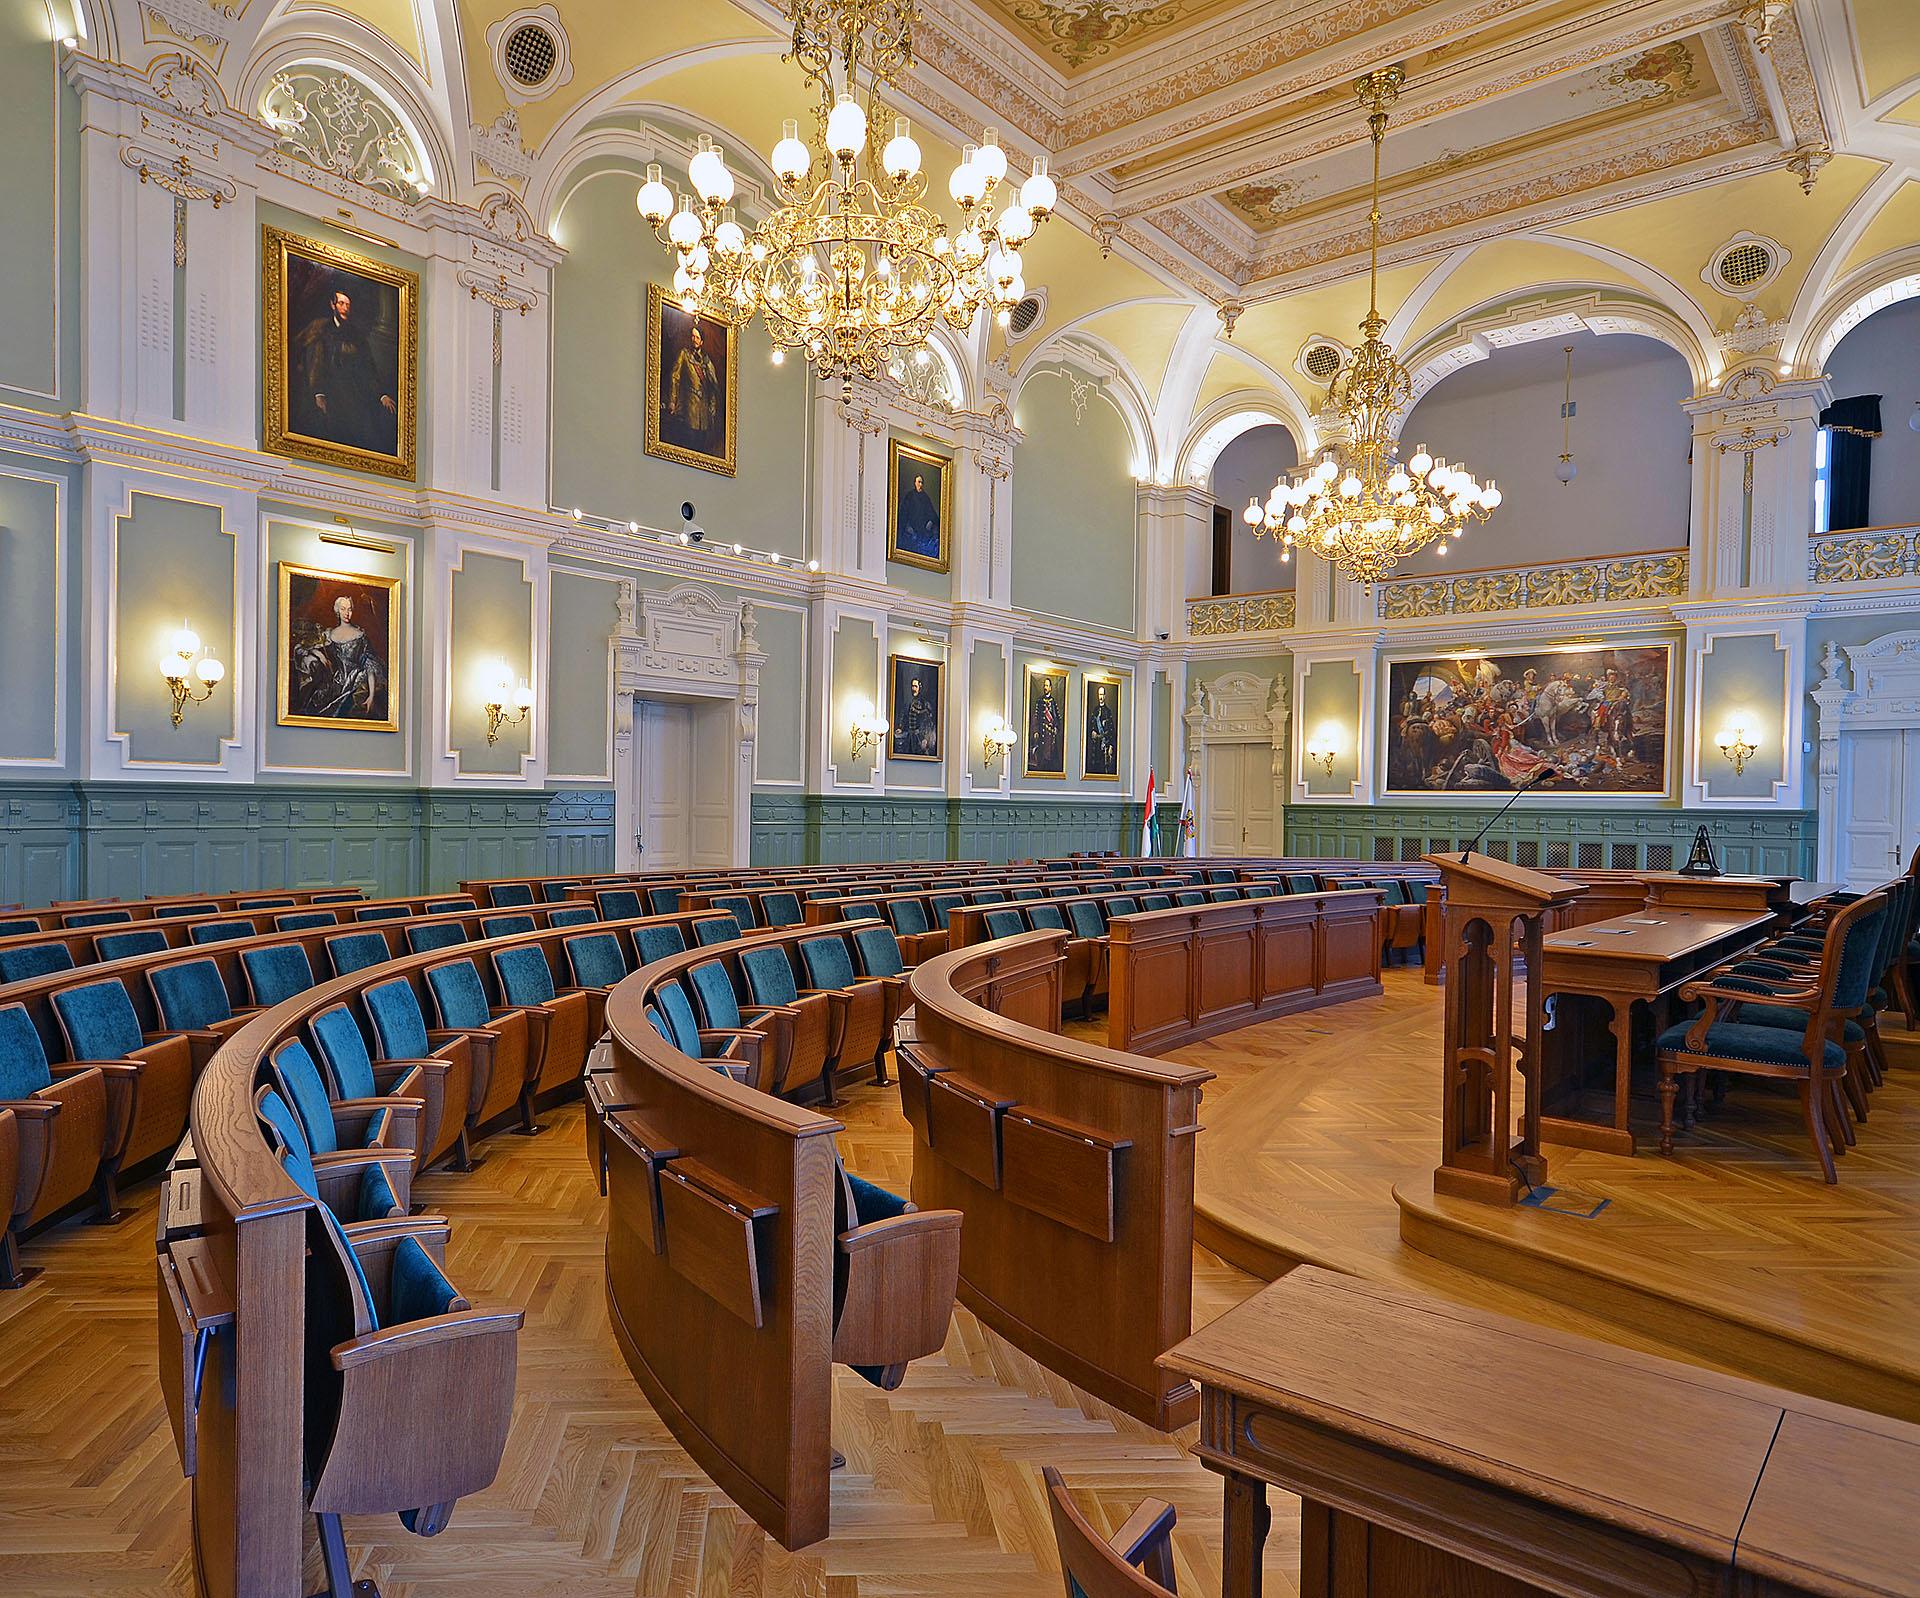 HU Györ Rathaus Festsaal 10 web